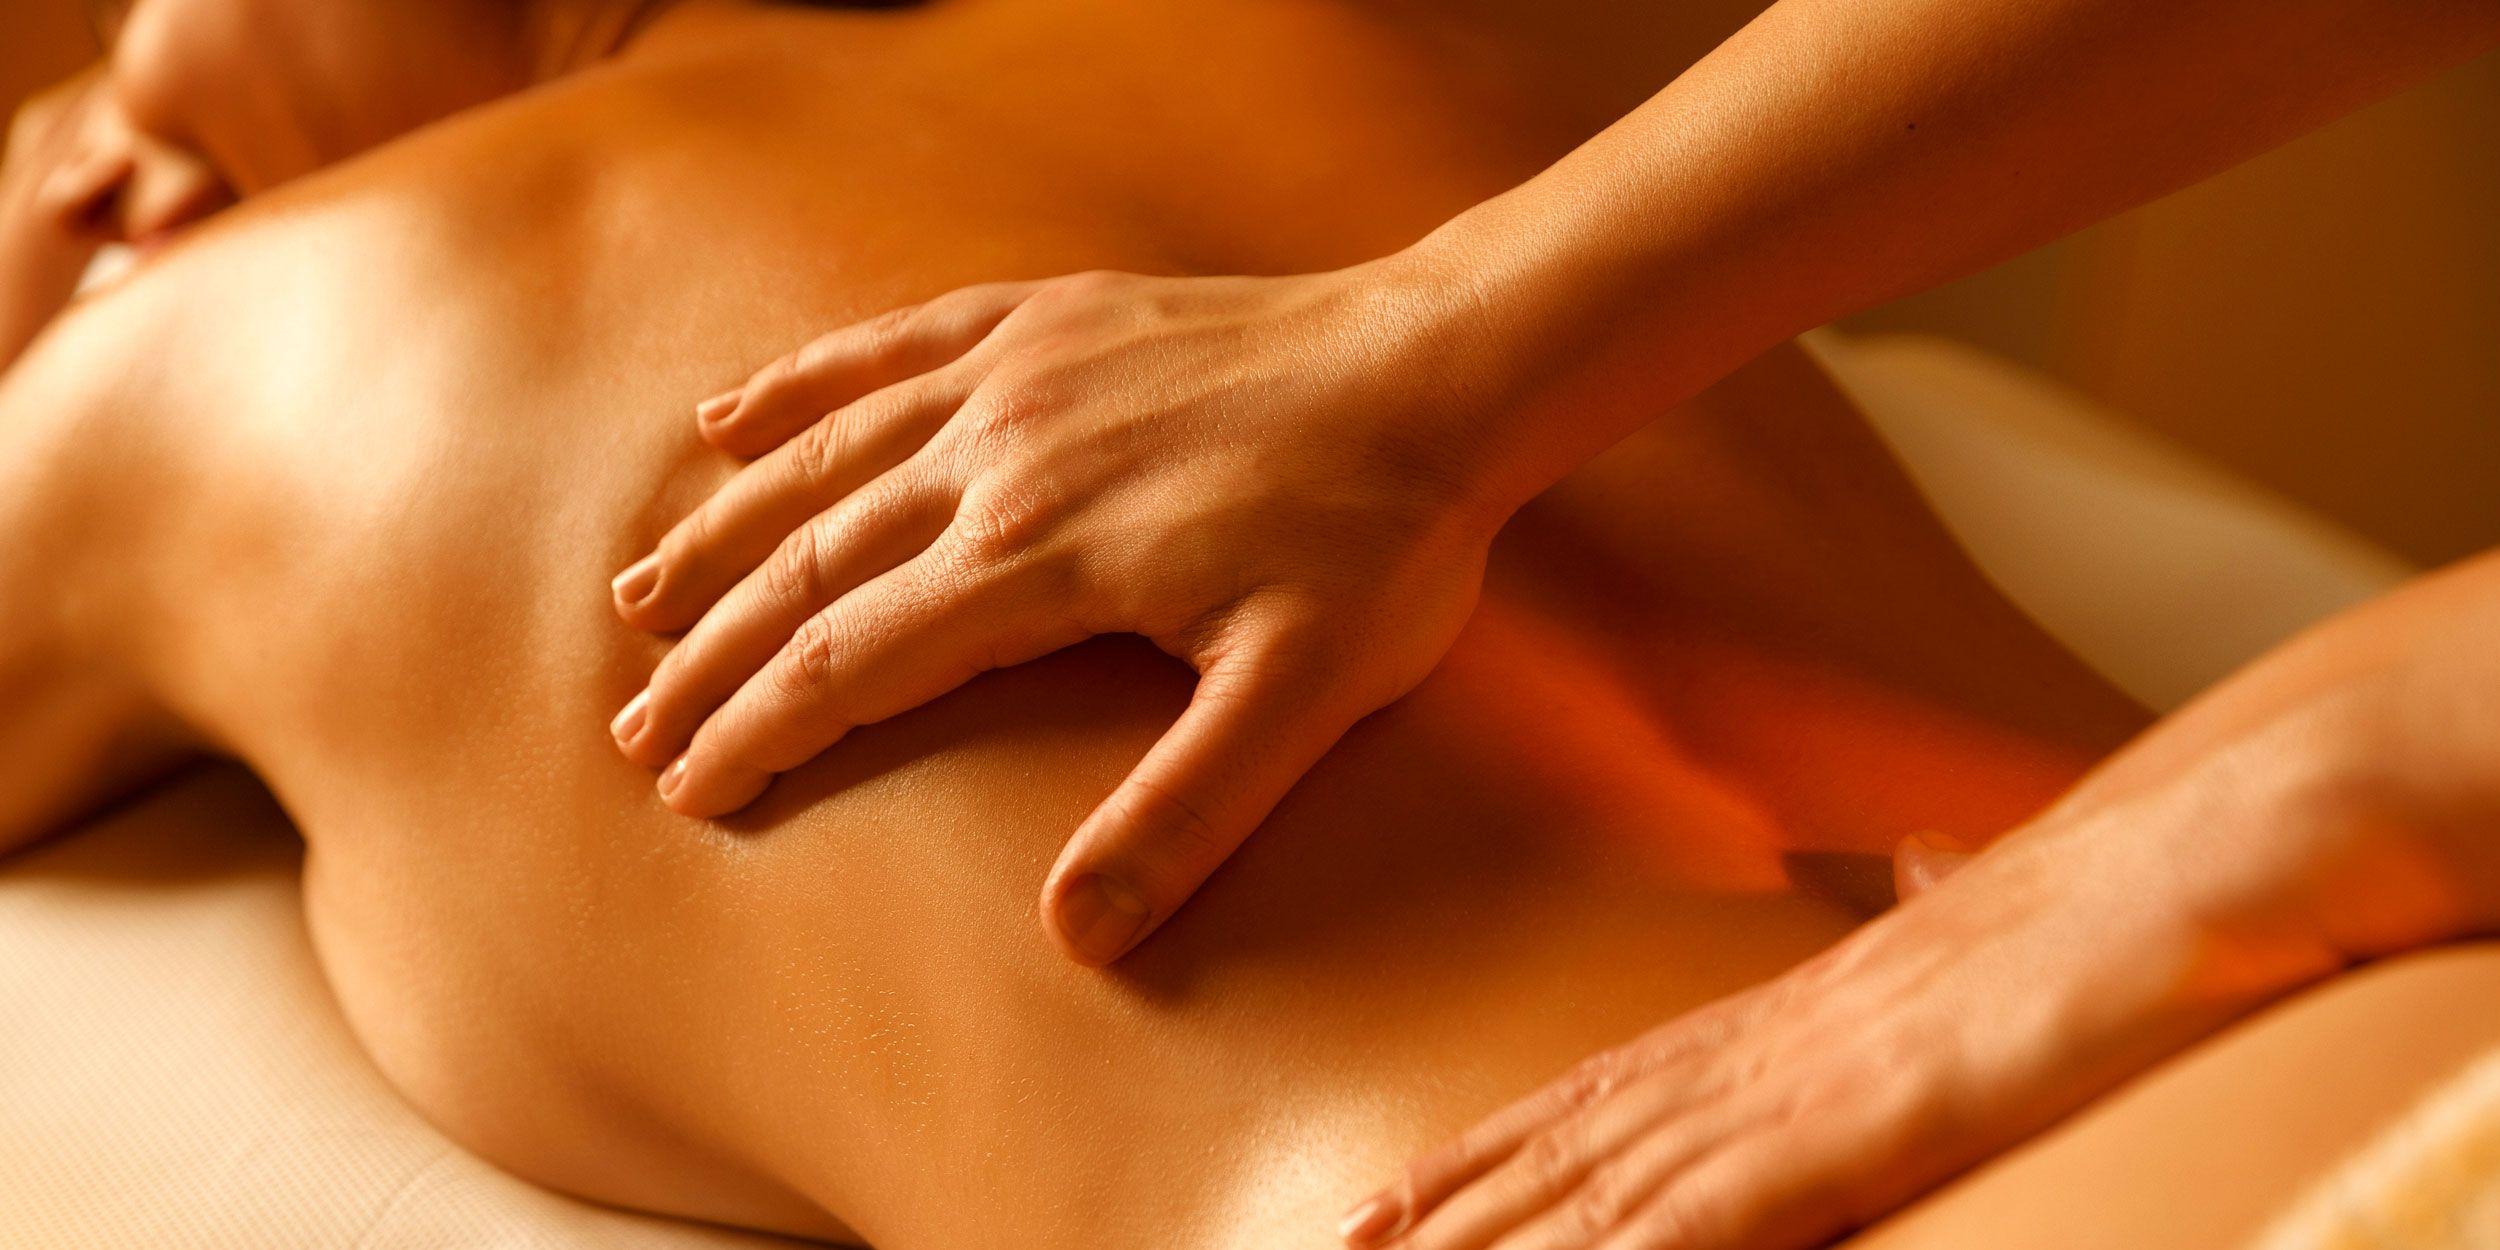 lingam massage best dating app